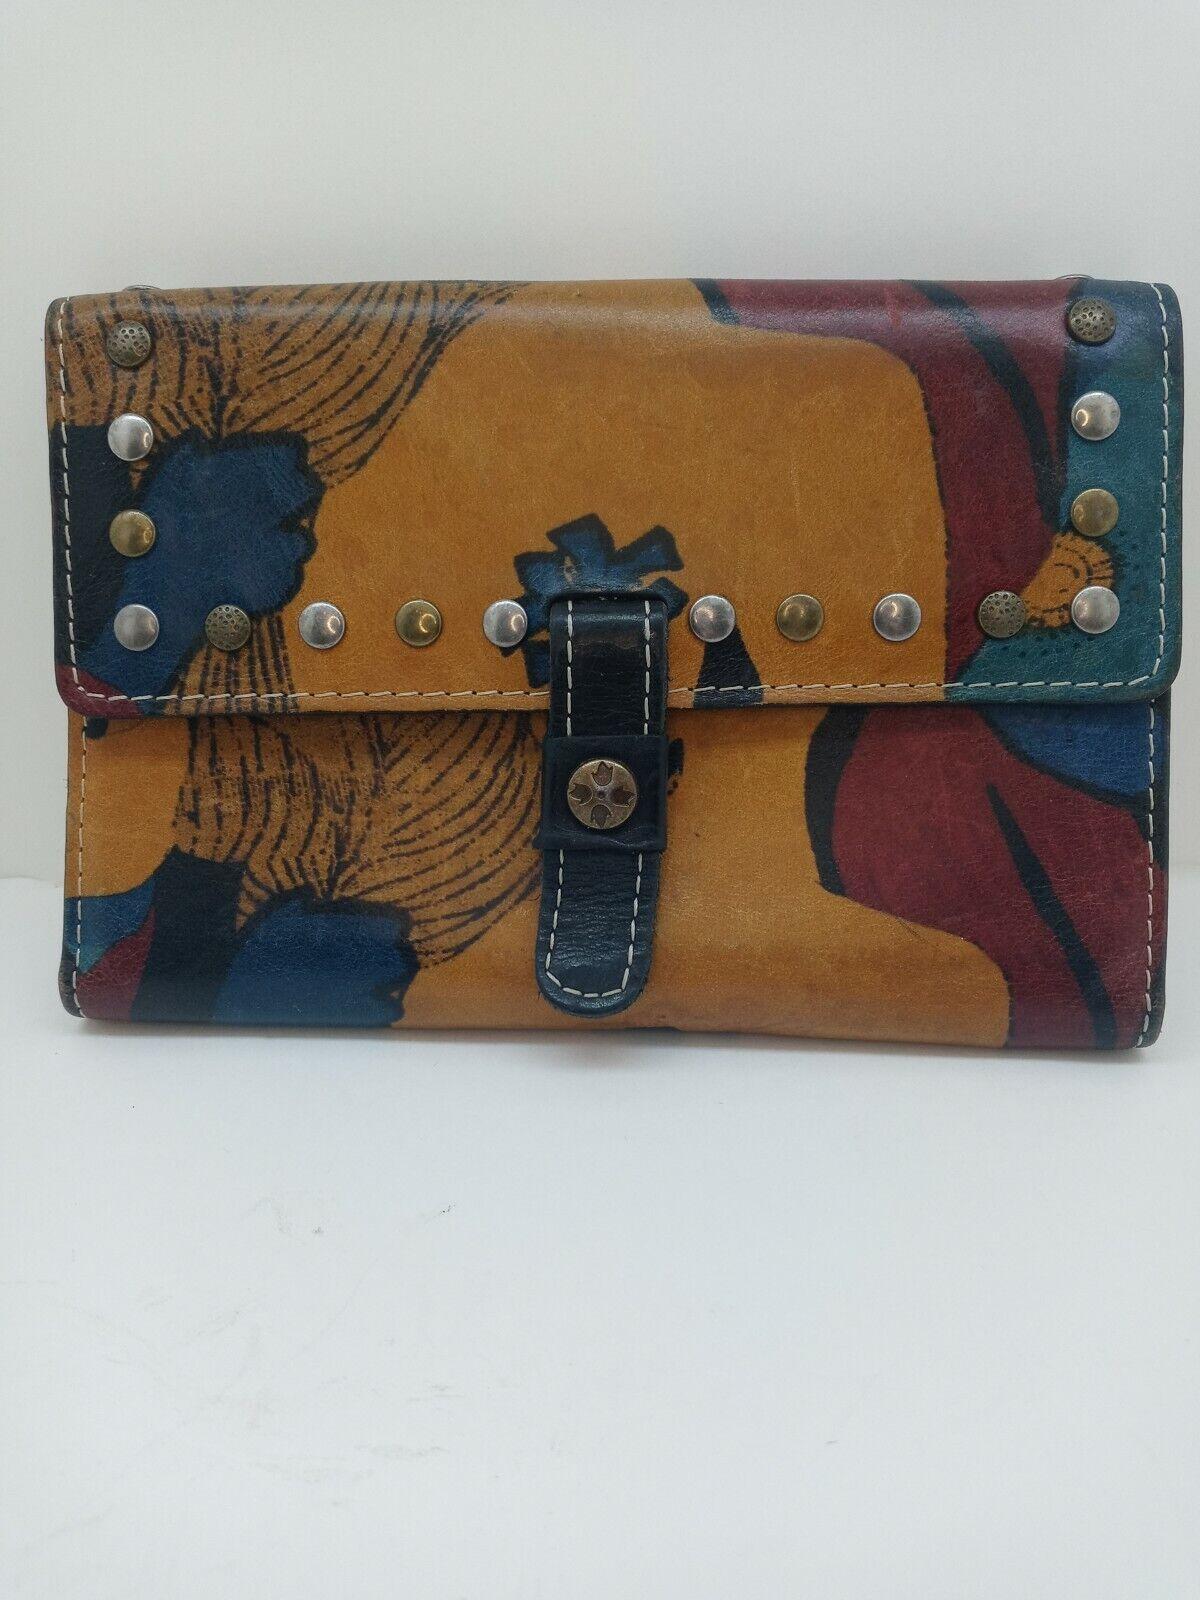 Patricia Nash Leather TriFold Wallet Floral,multicolor, organizer, checkbook,GUC